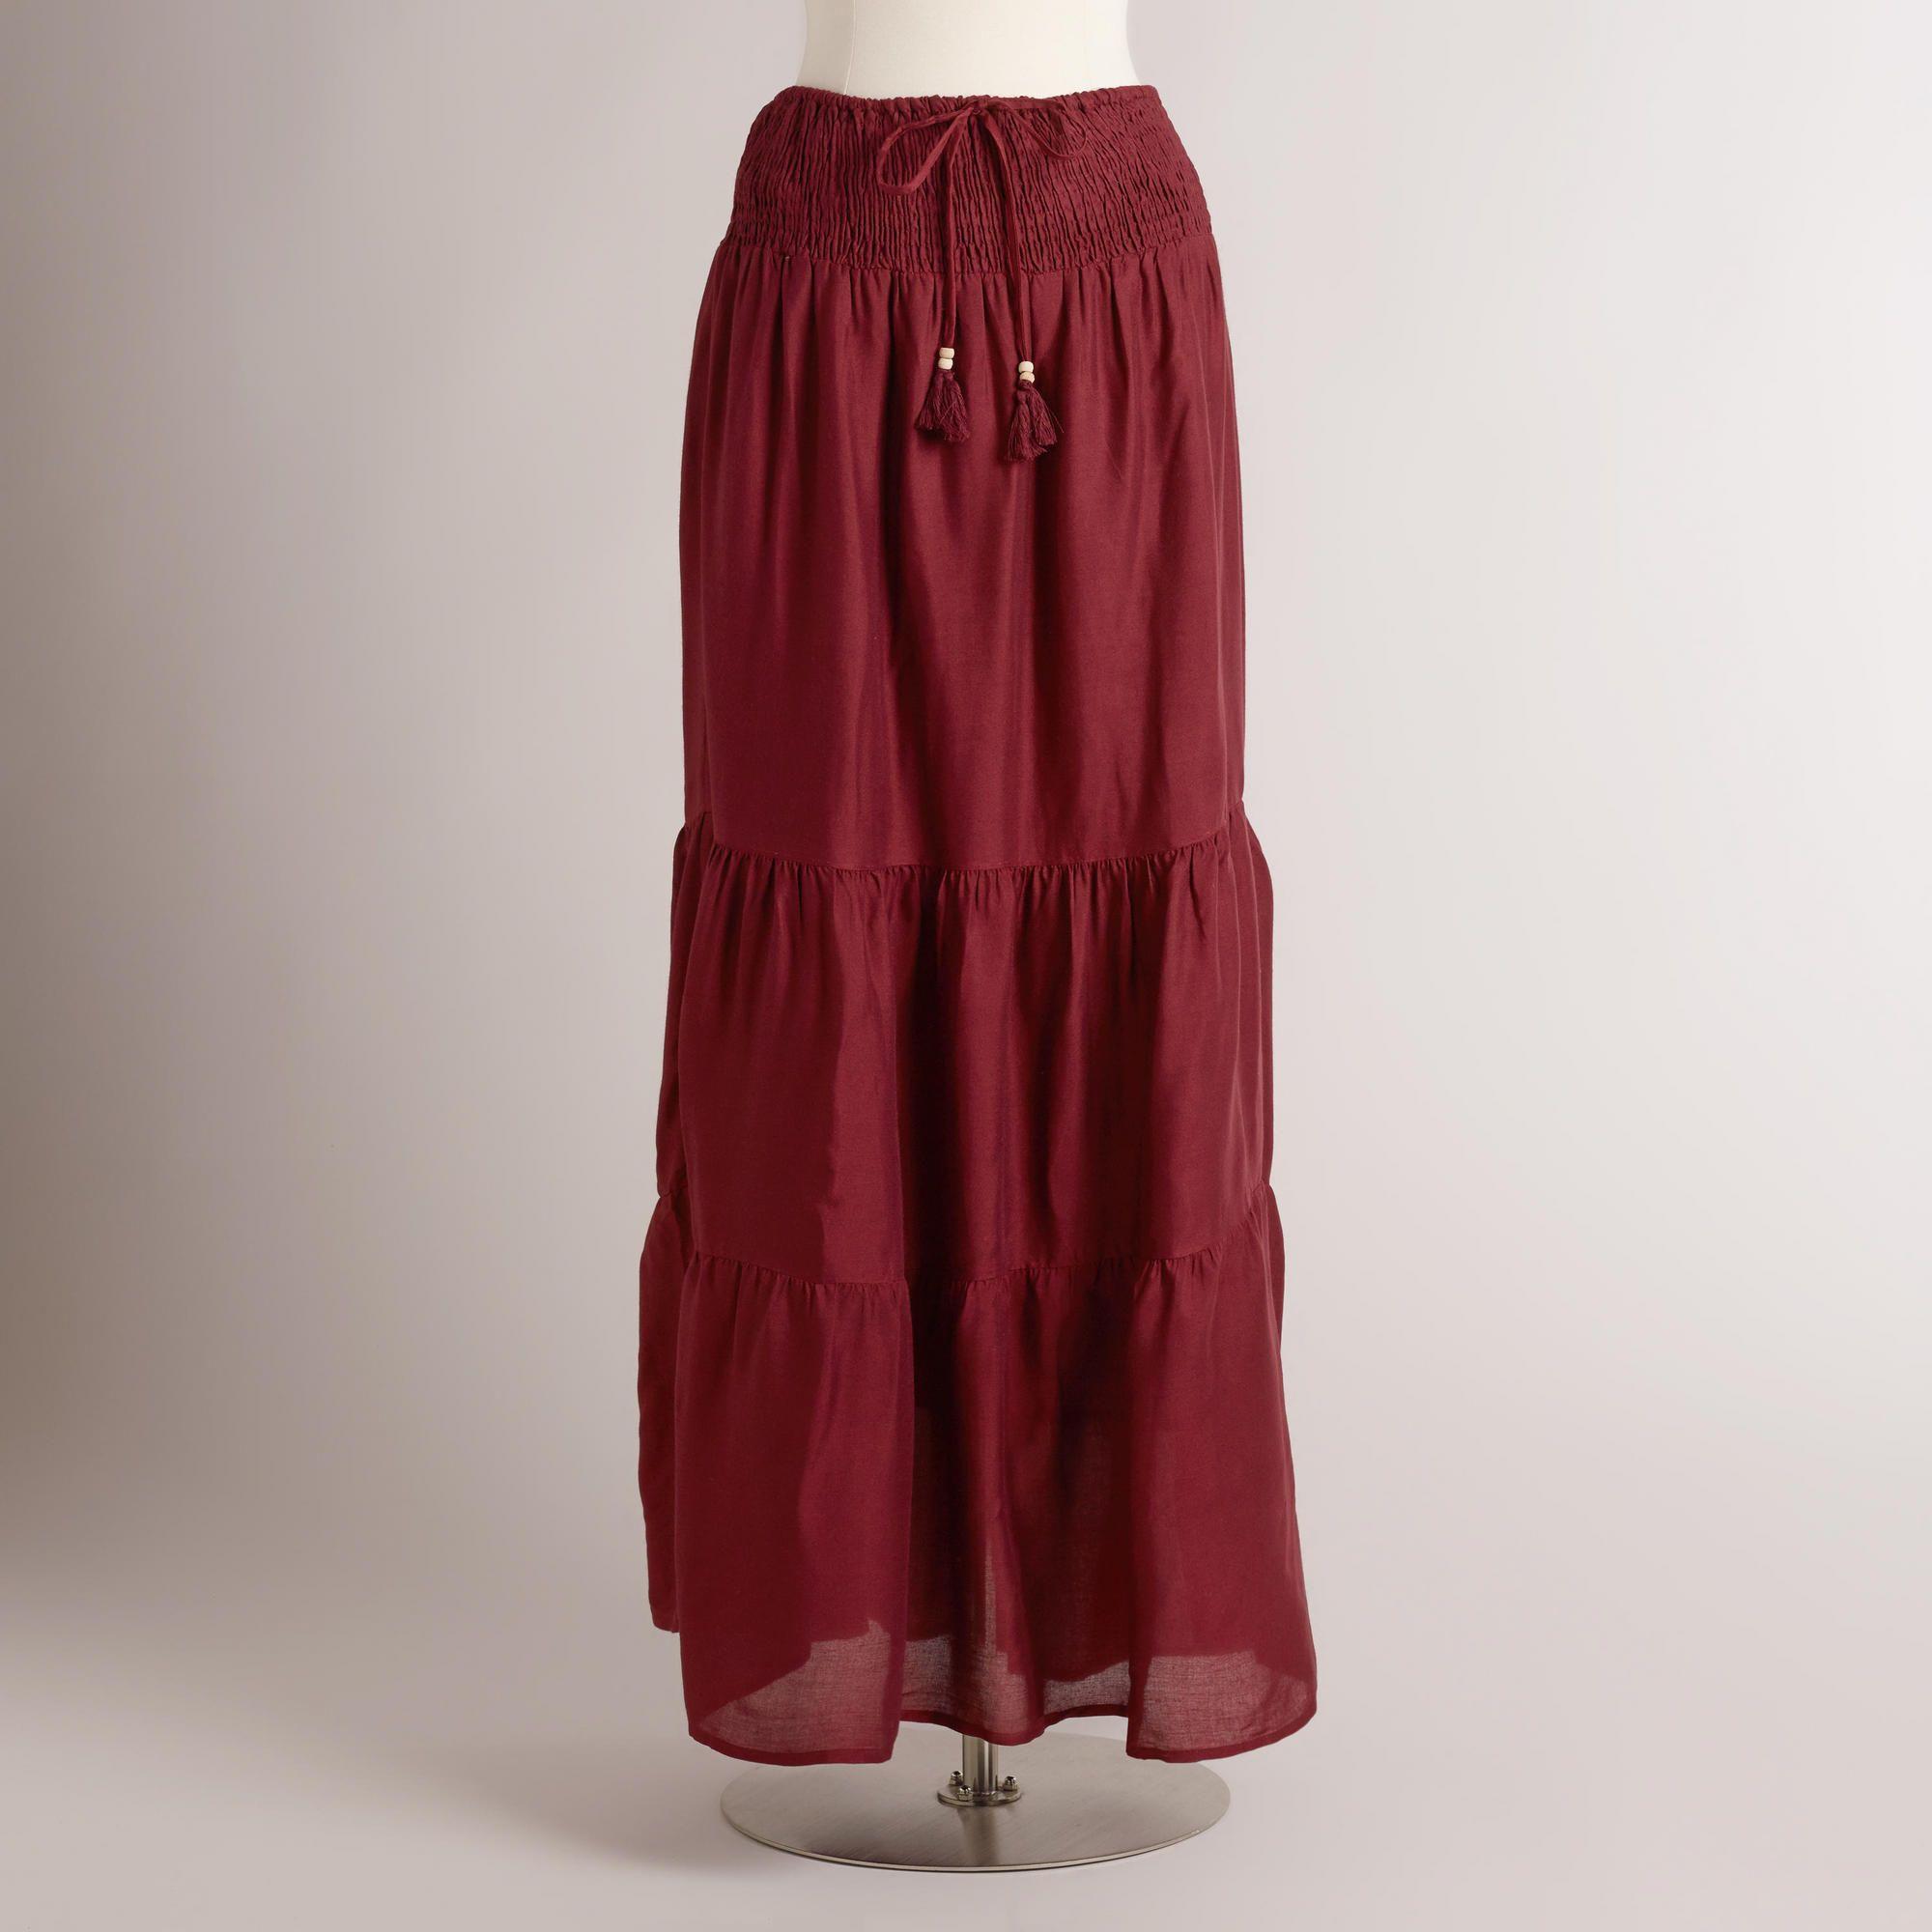 Maroon Lalana Skirt   World Market